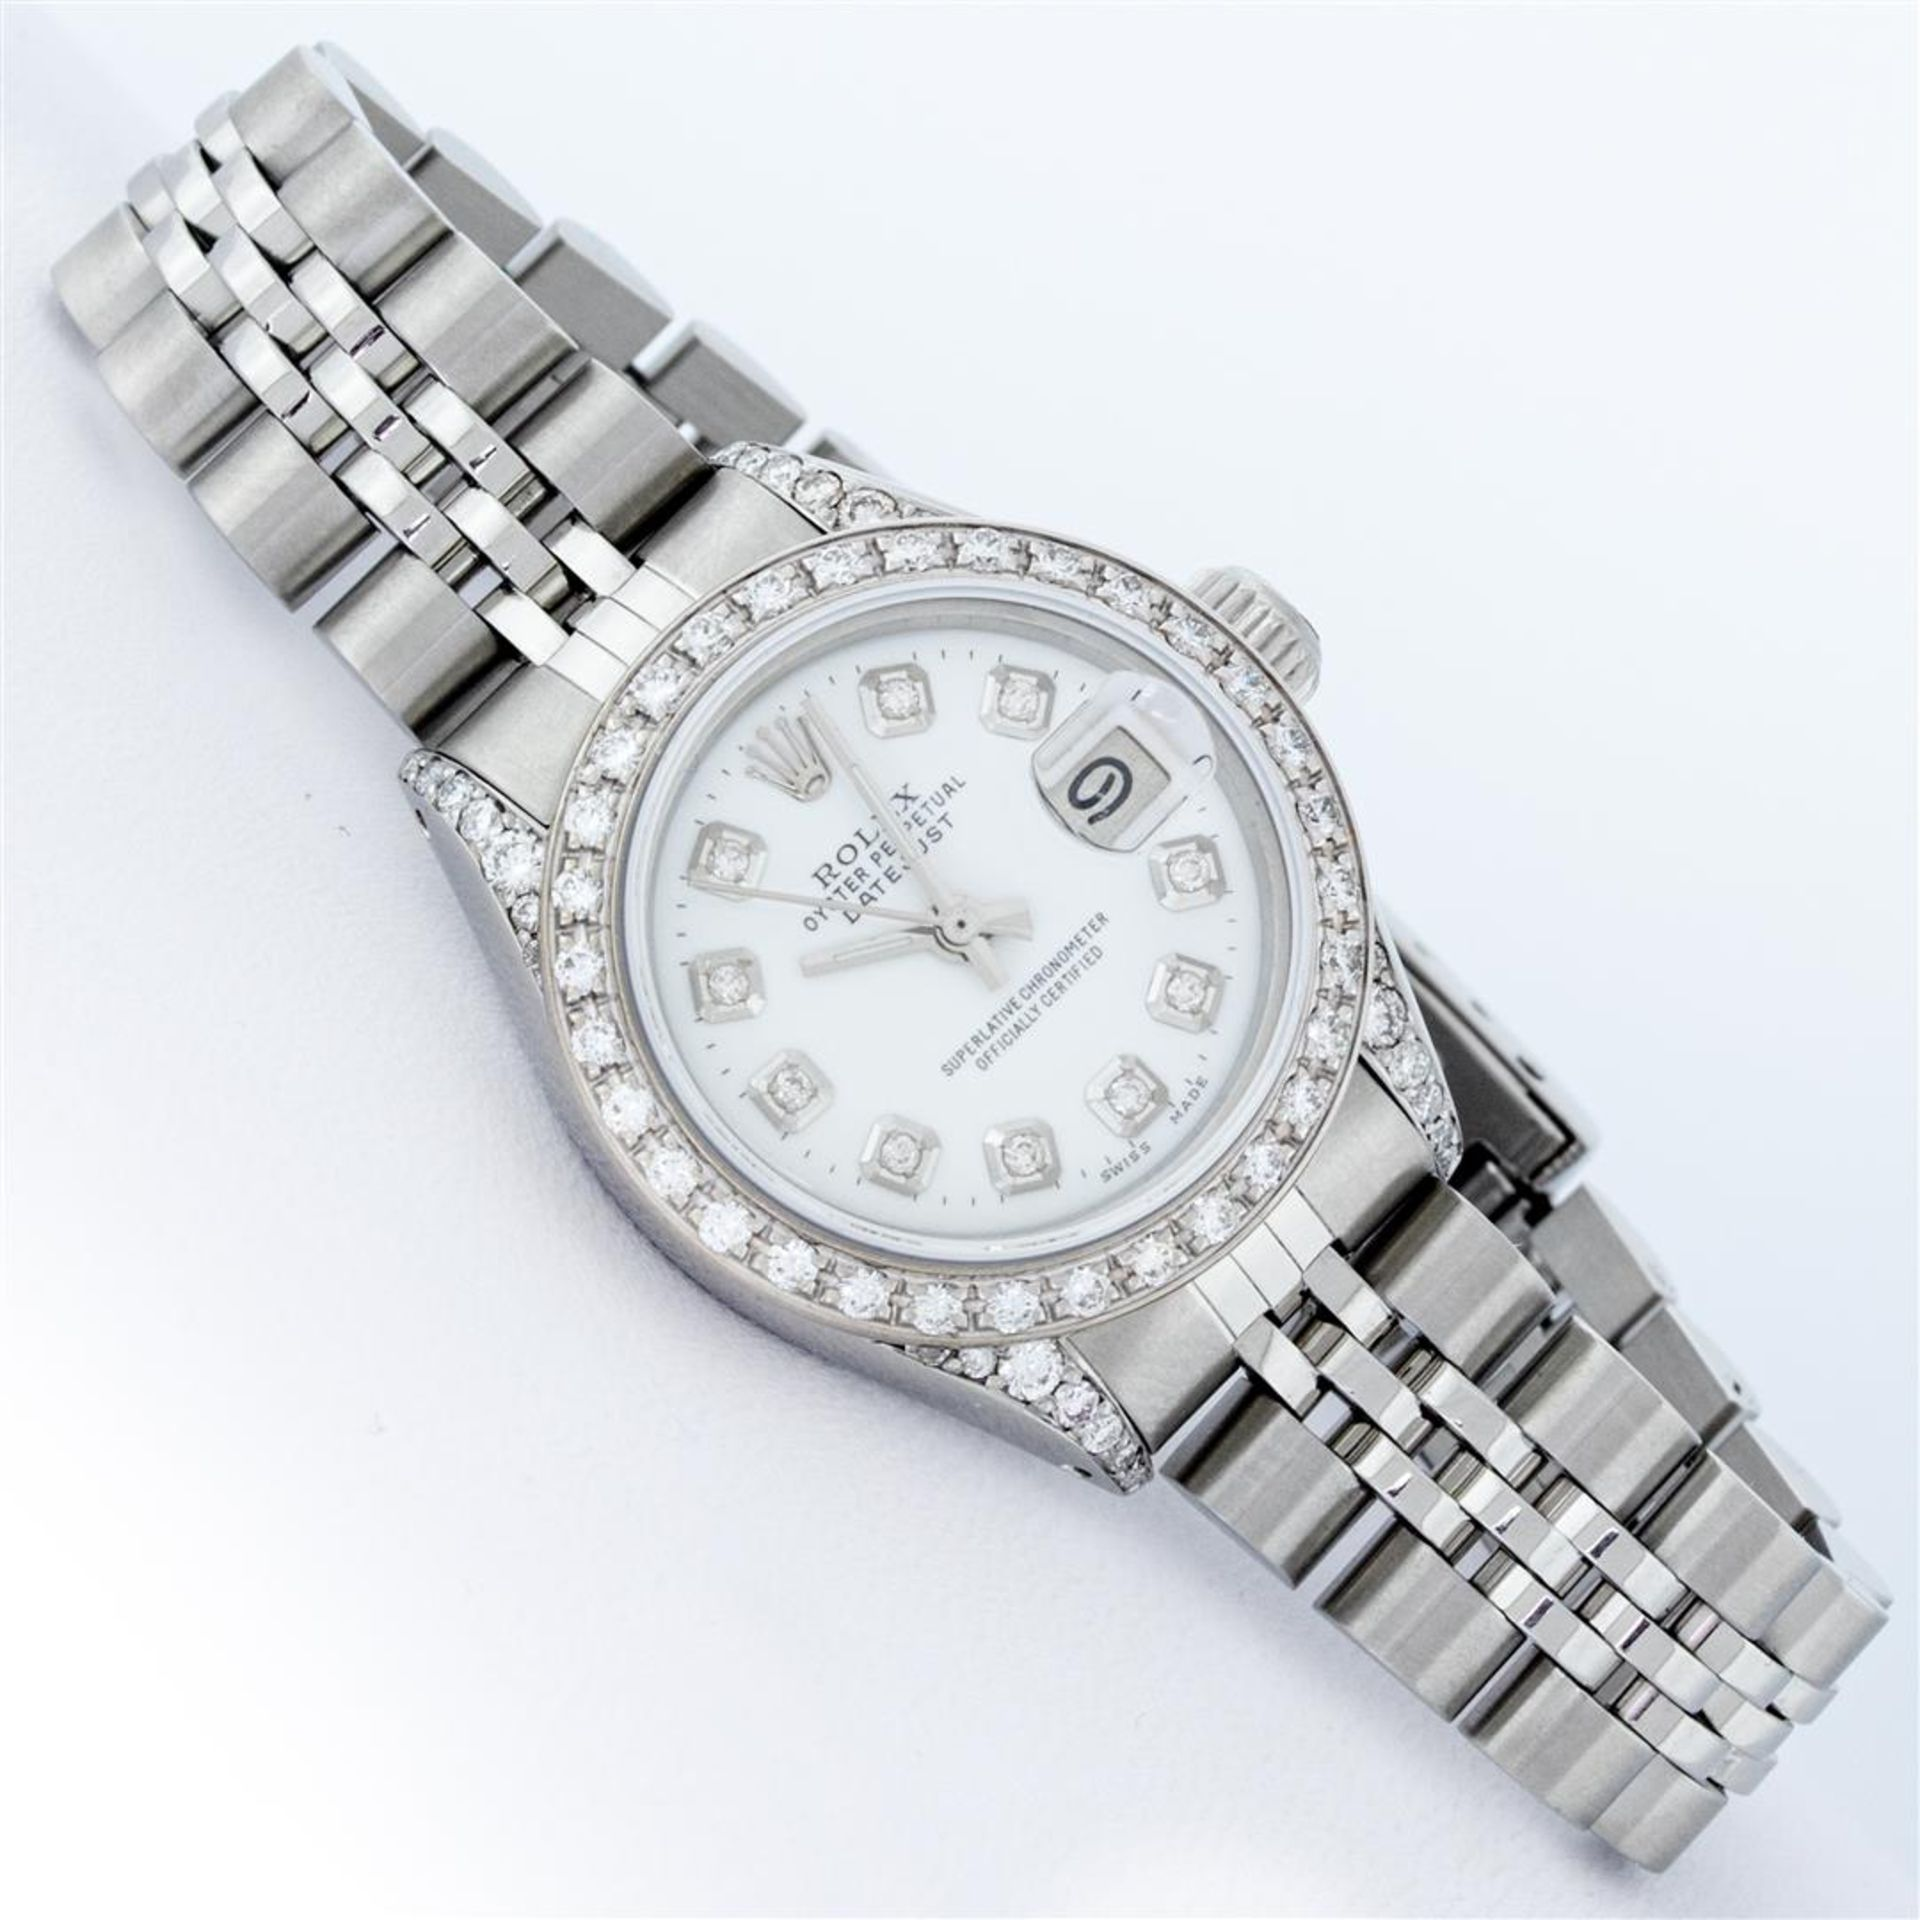 Rolex Ladies Stainless Steel White Diamond Lugs & Datejust Wristwatch - Image 3 of 9